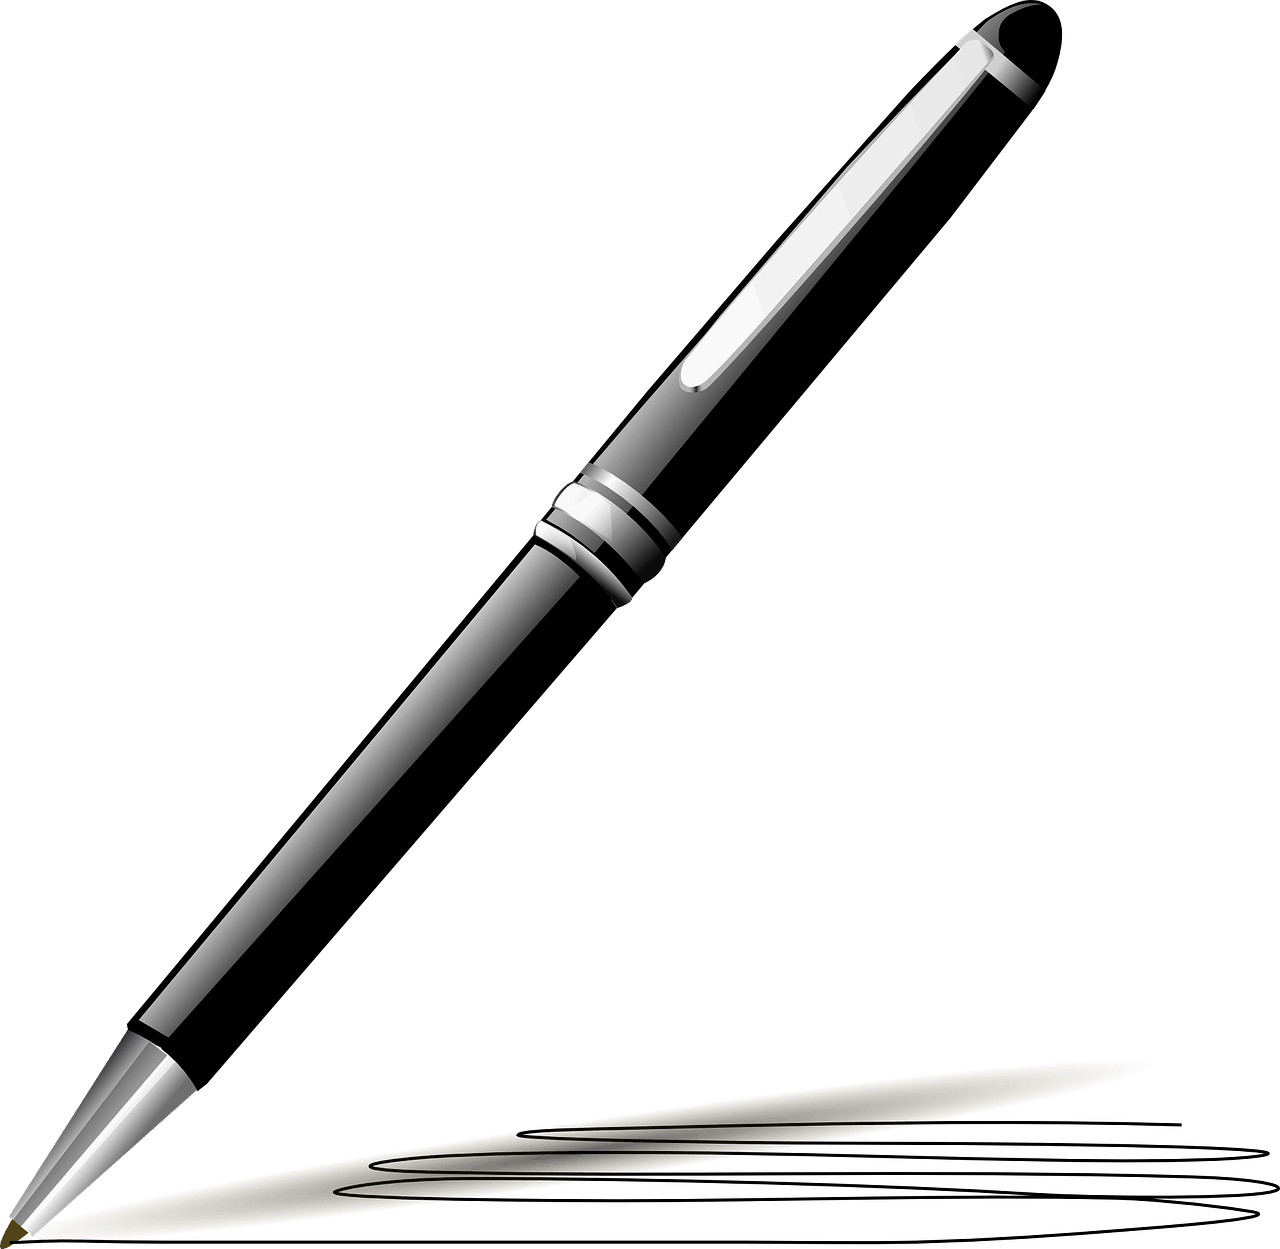 עט כותב